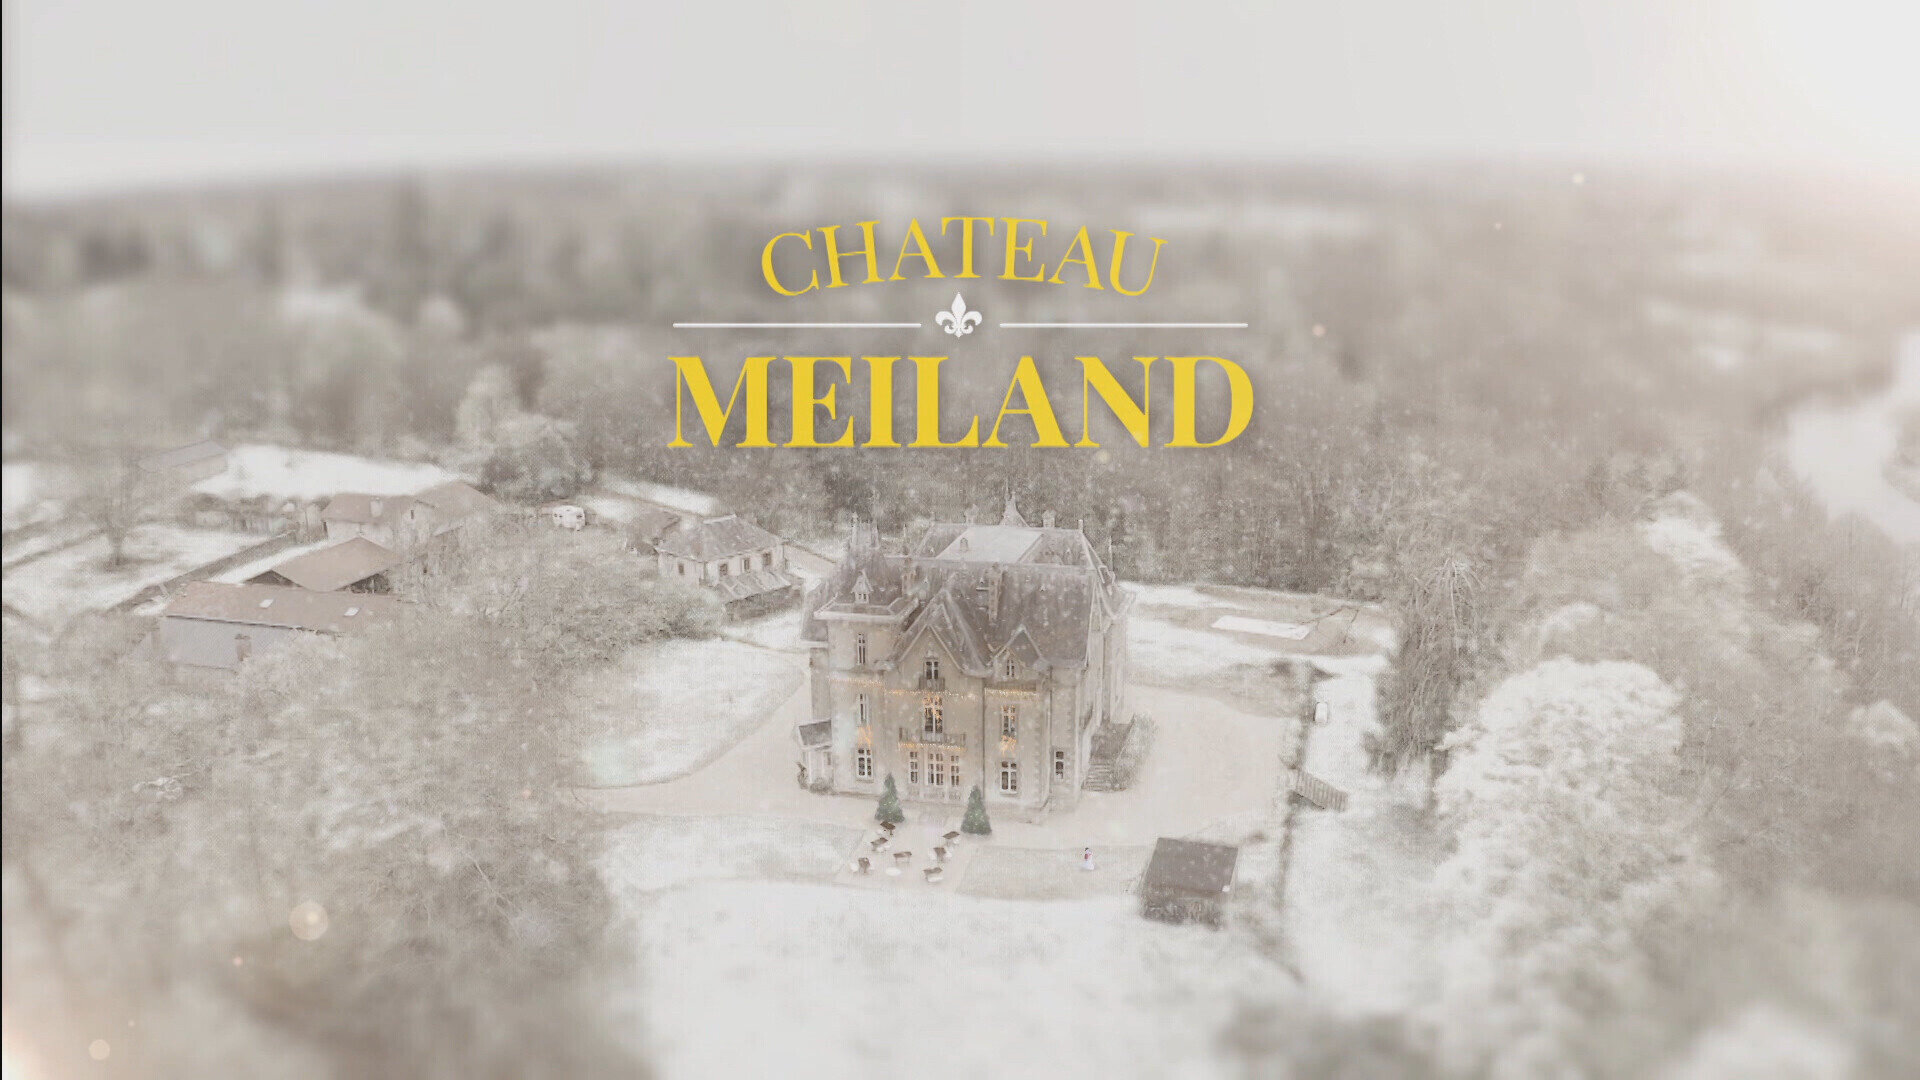 Chateau Meiland - Seizoen 2